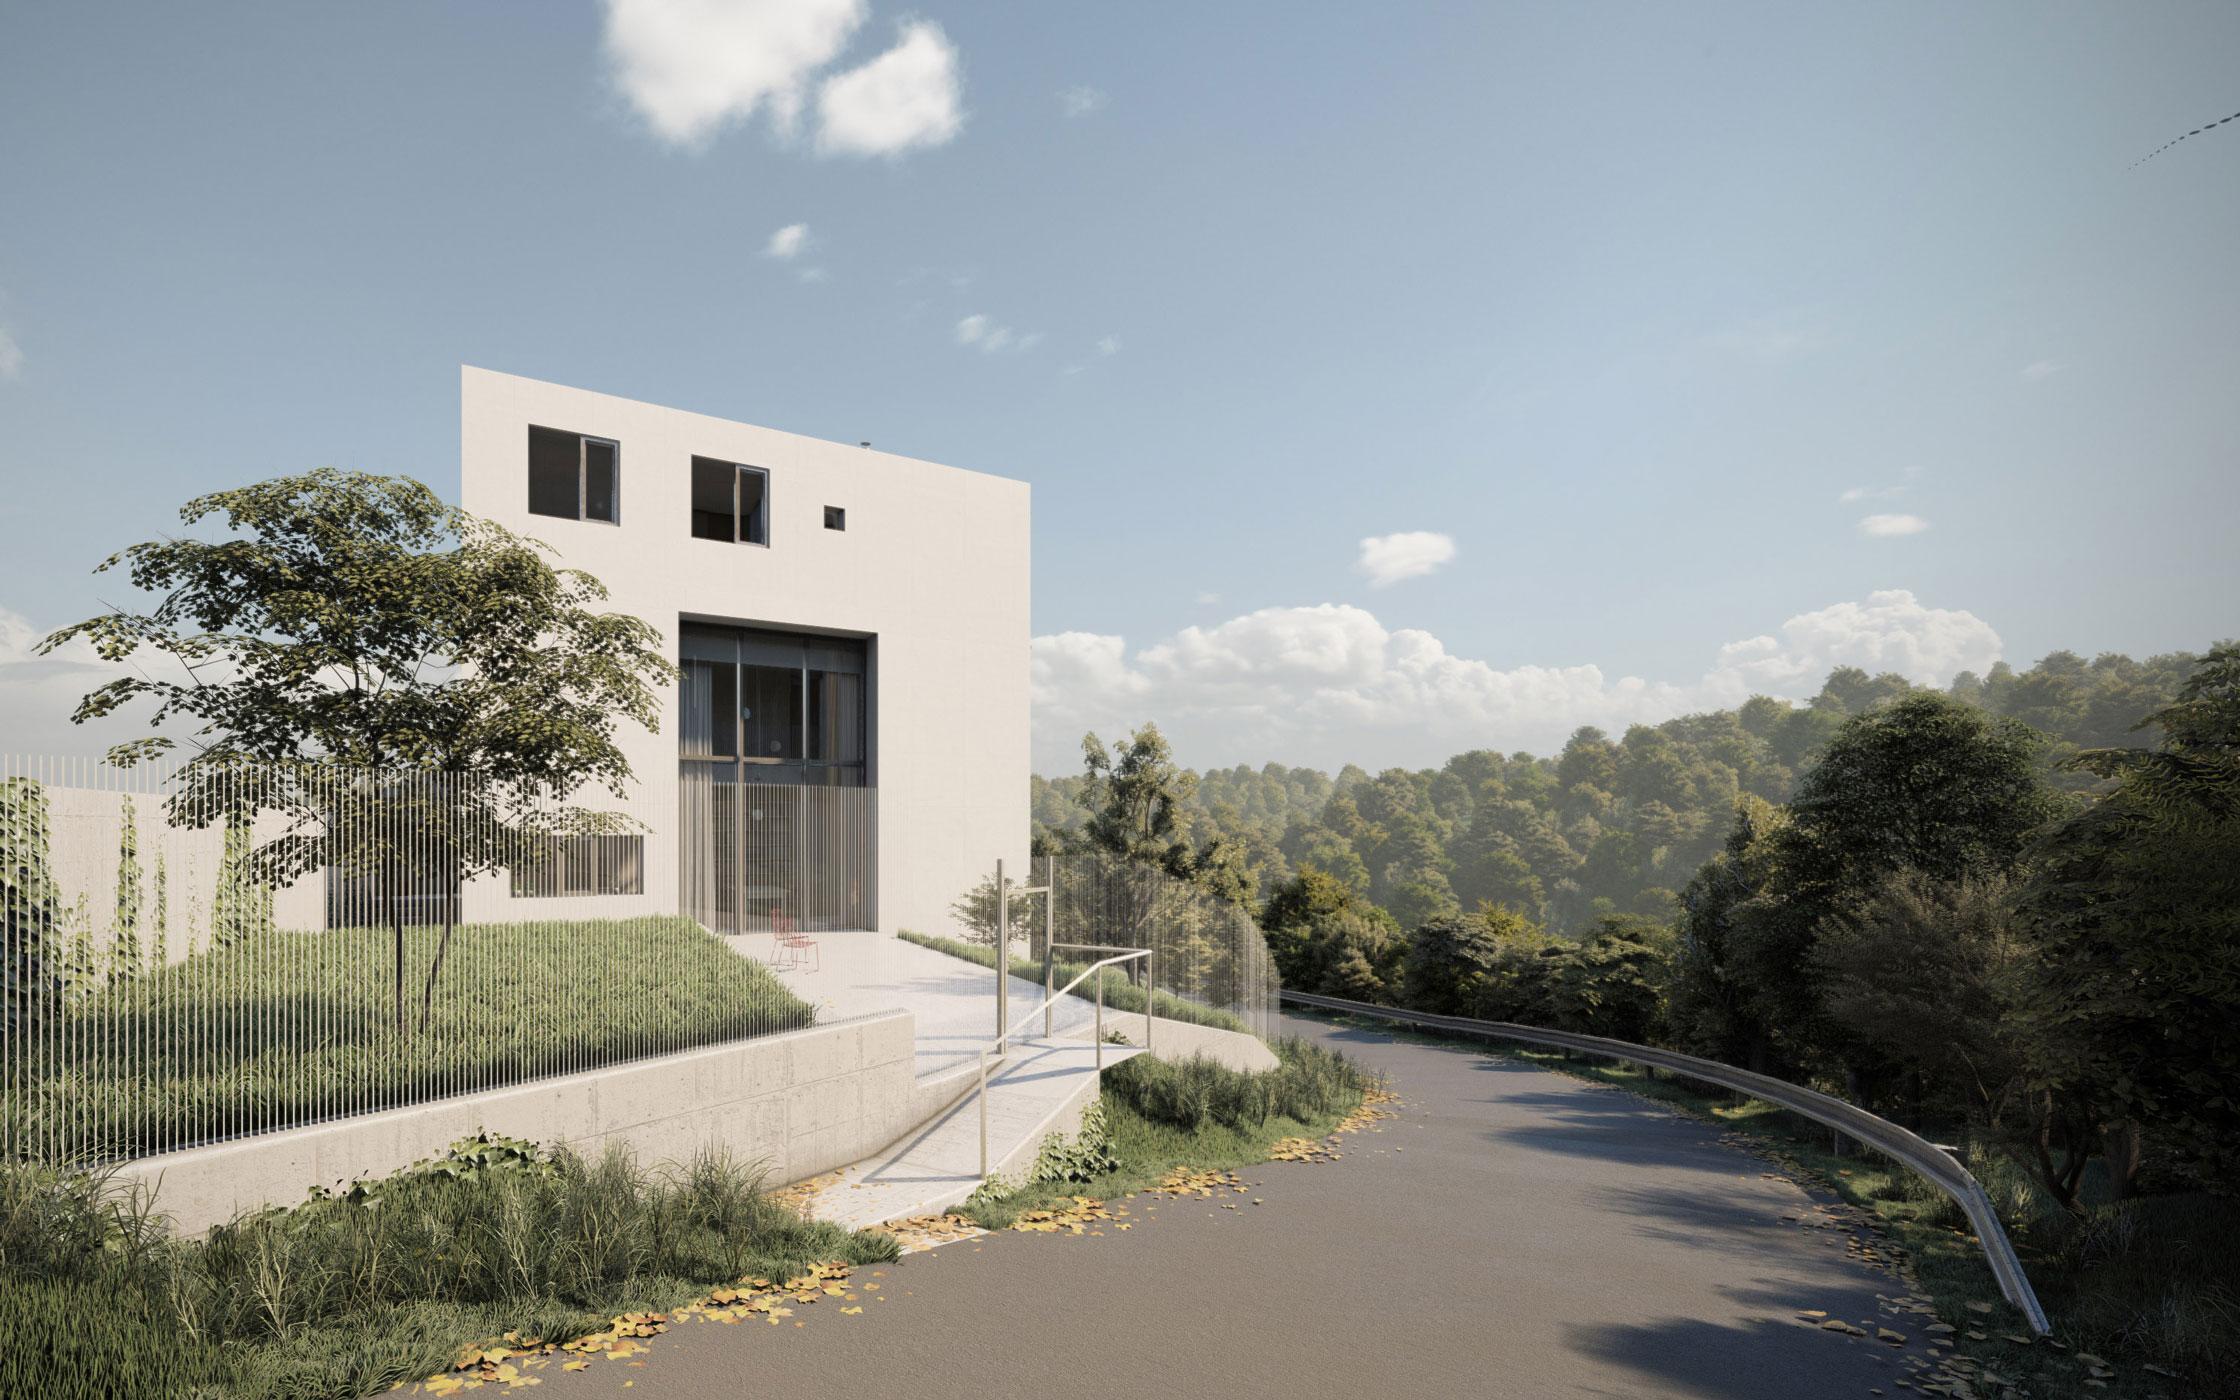 Zavoral Architekt Rodinný dům Štechovice